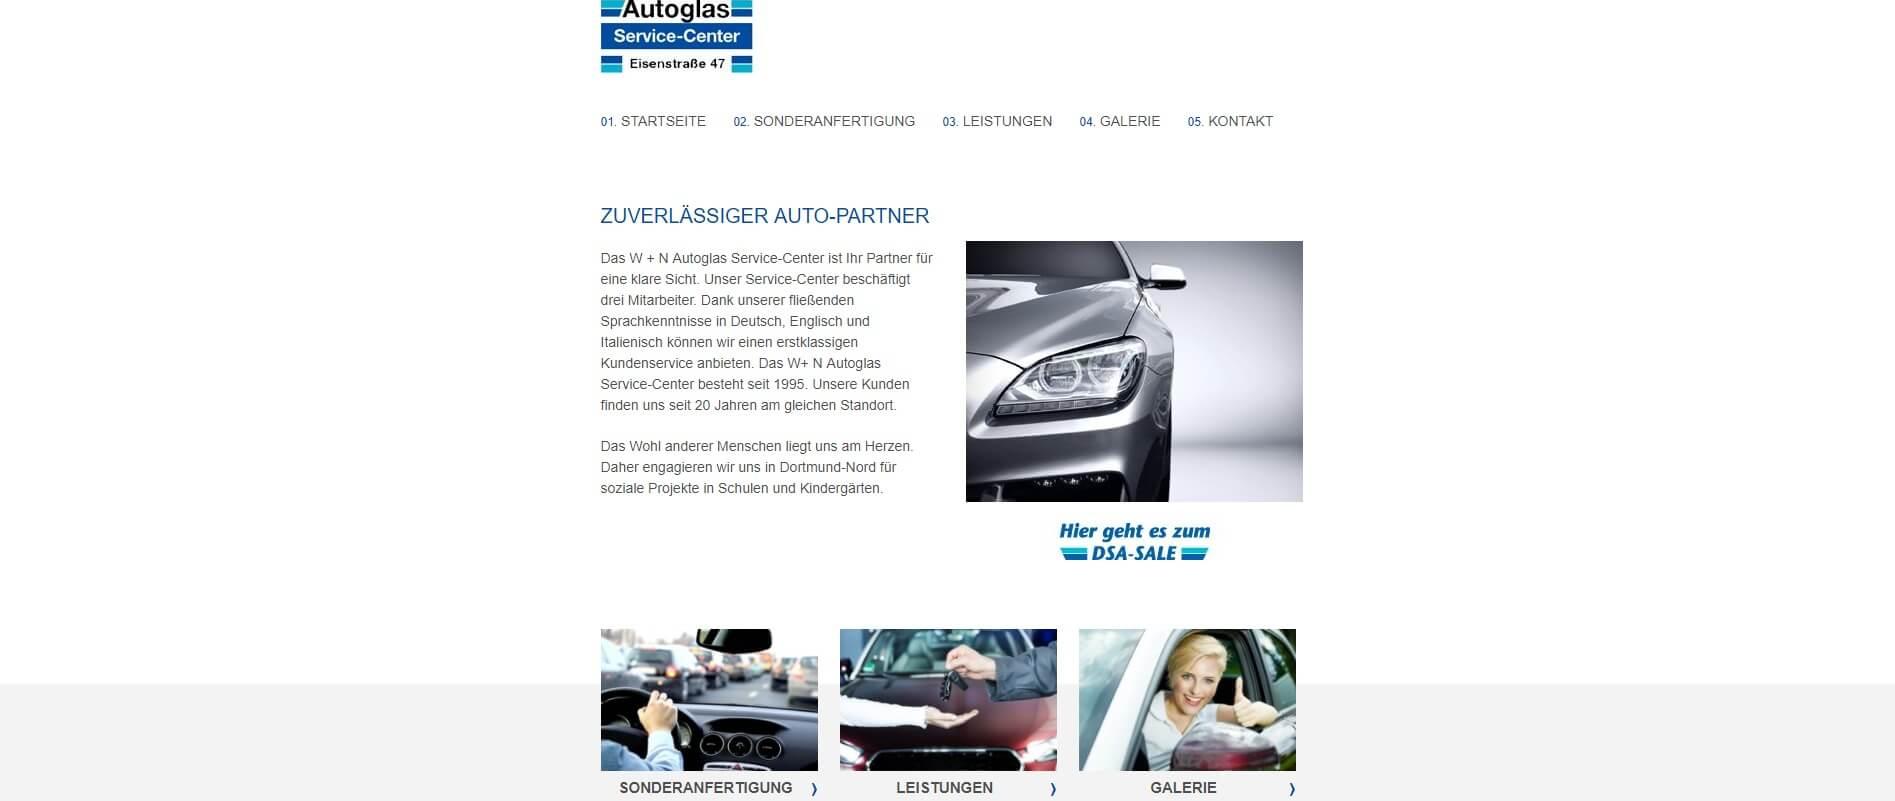 Image of W + N Autoglas-Service GmbH in Dortmund